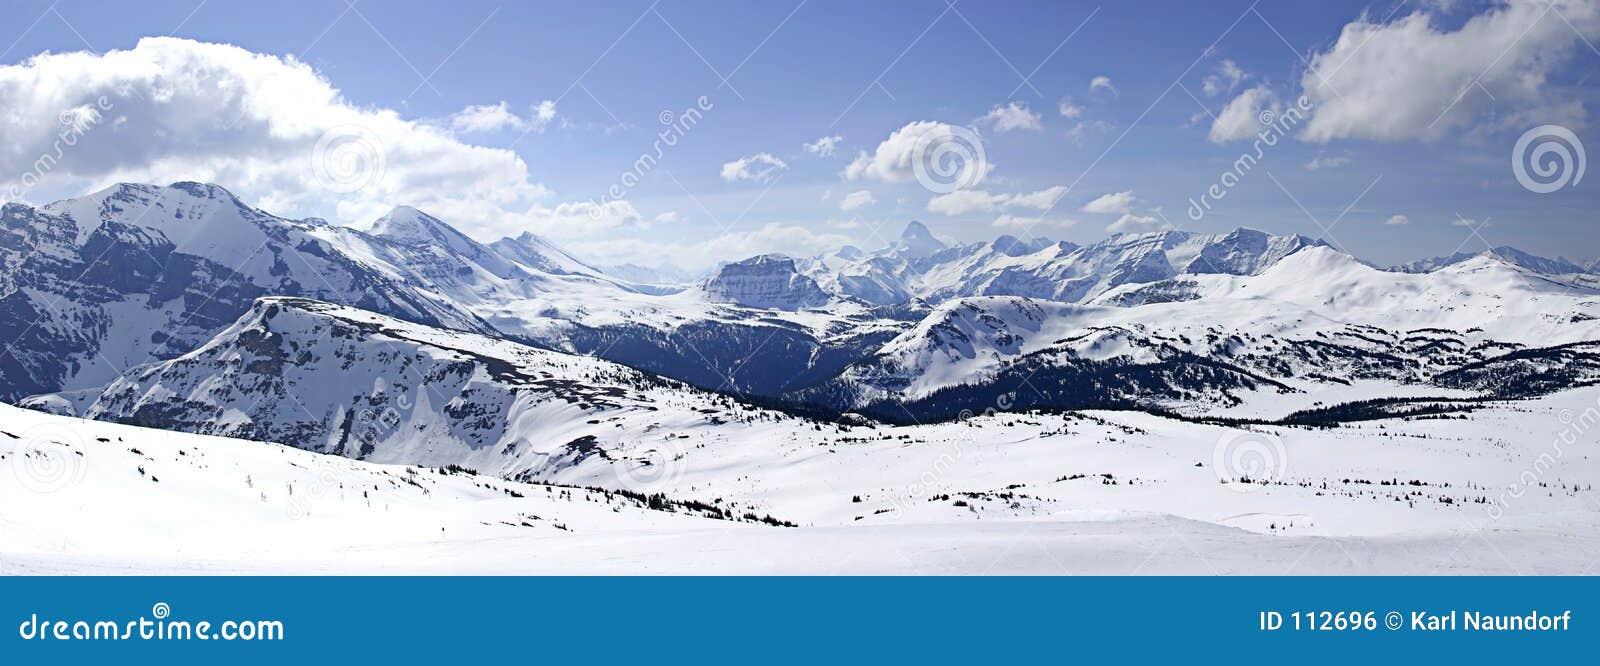 Montanha nevado II panorâmico